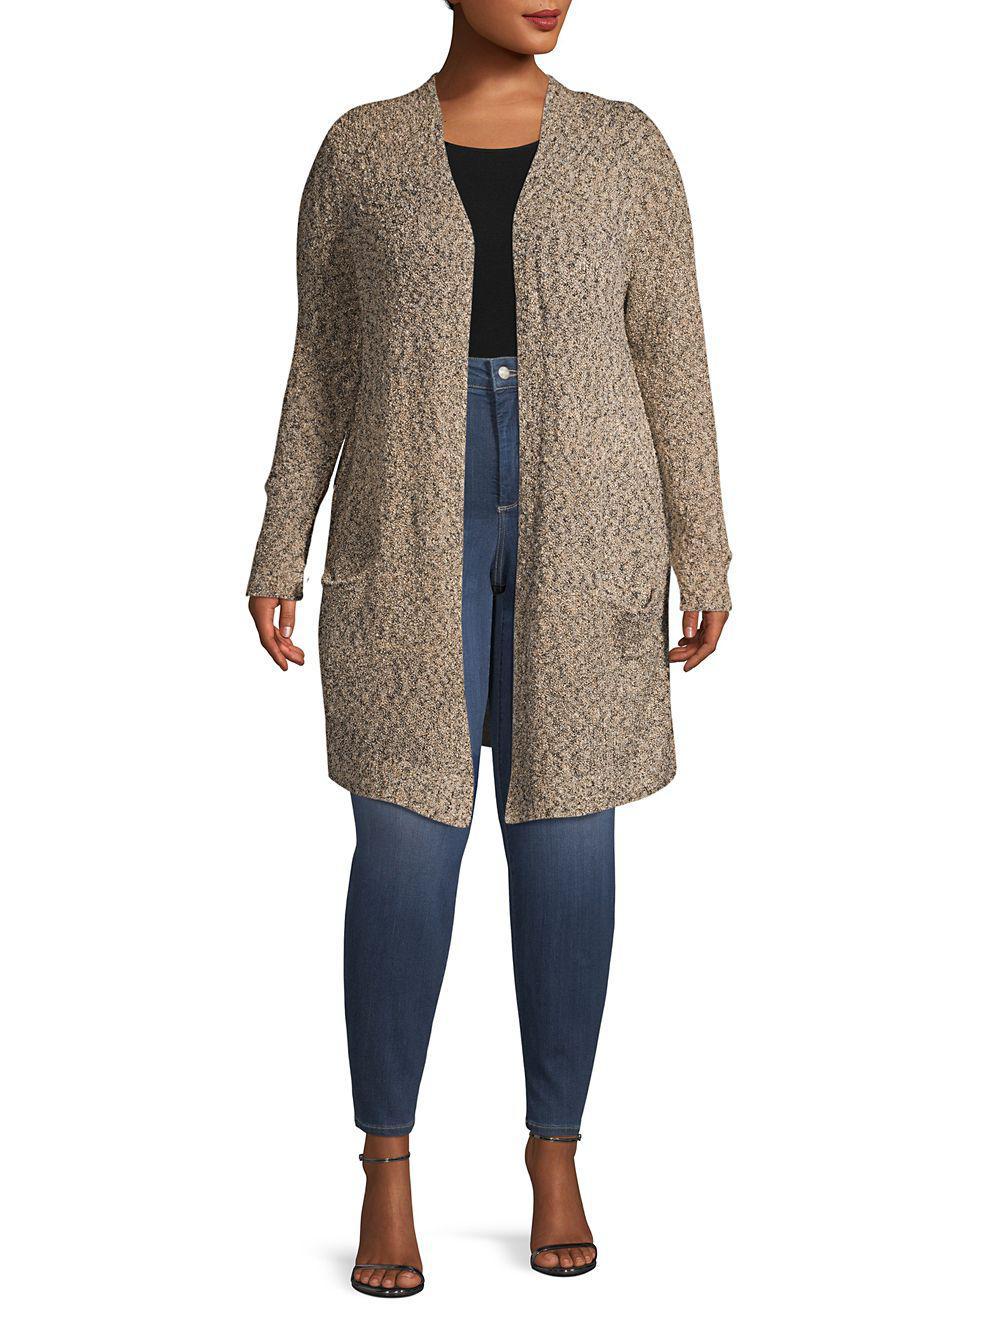 a02e5c0dd36 Lyst - Rafaella Plus Textured Open-front Cardigan in Natural